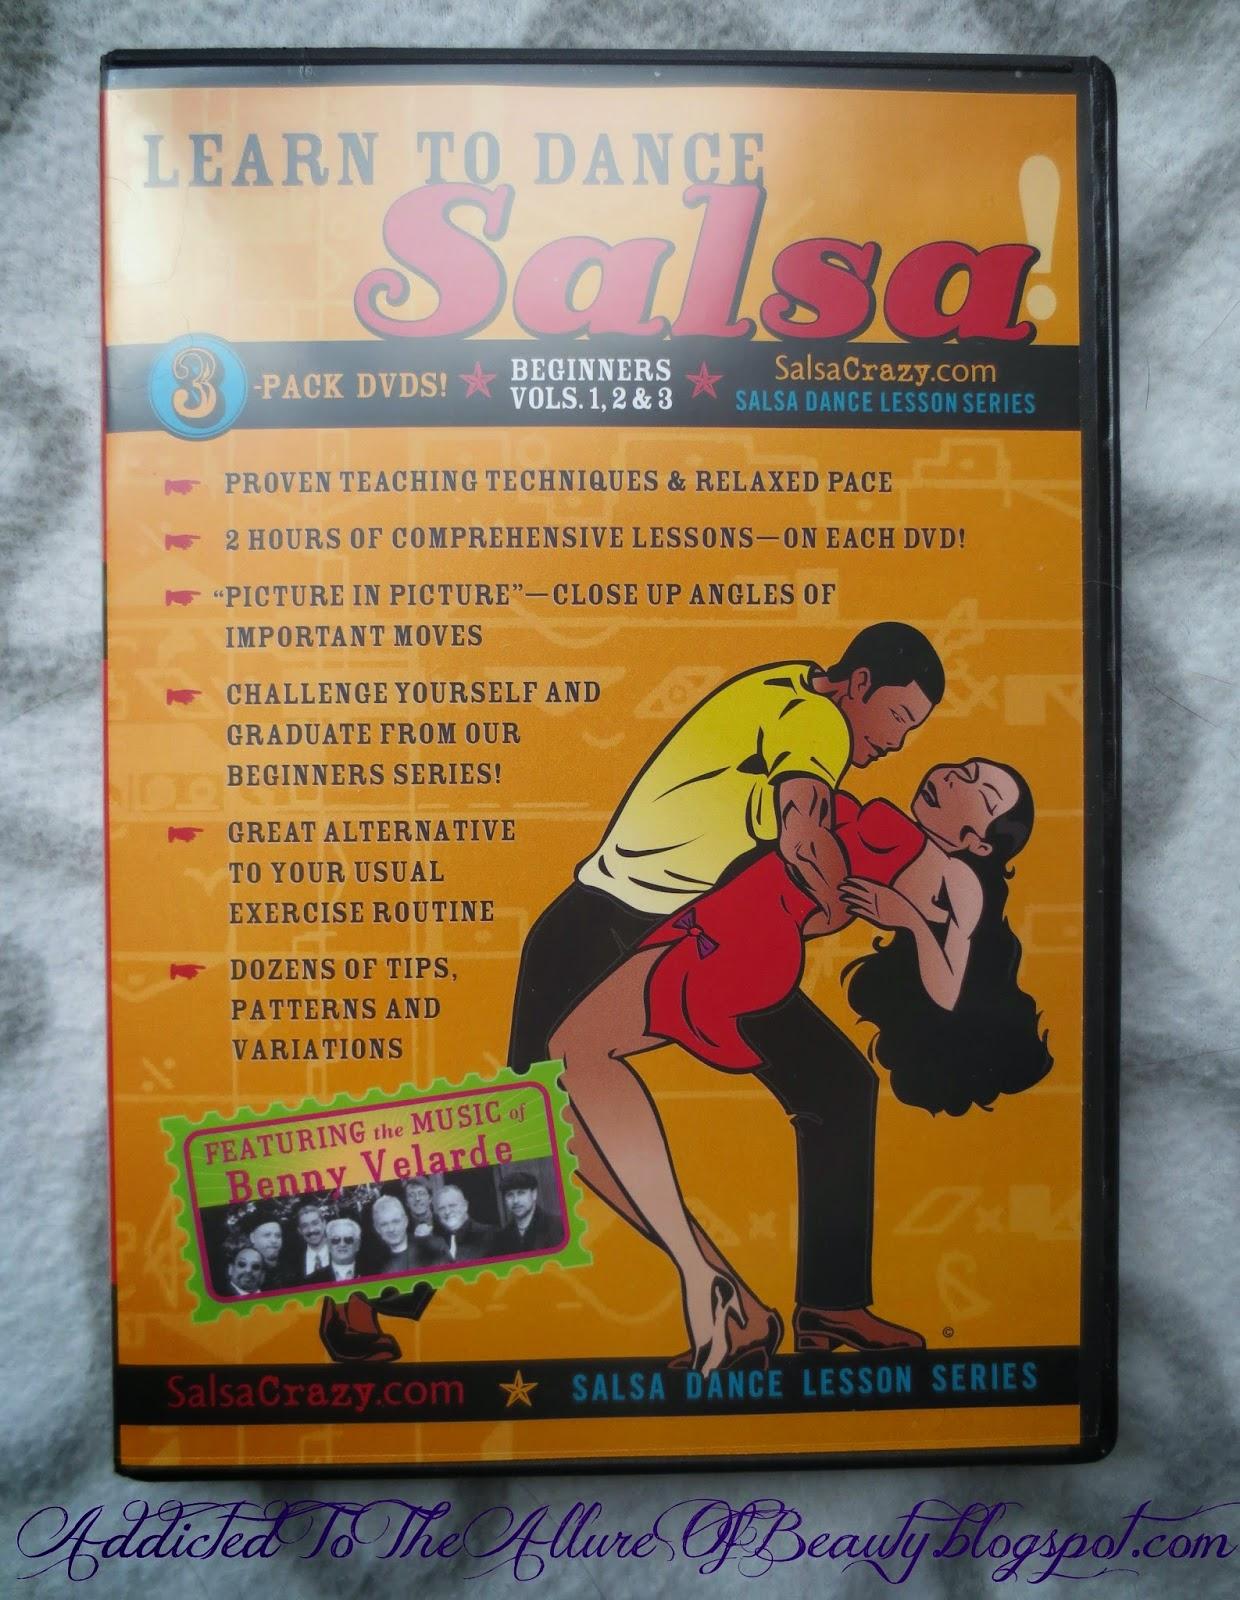 DanceFlix - Rent Instructional Dance DVDs - Learn How To ...